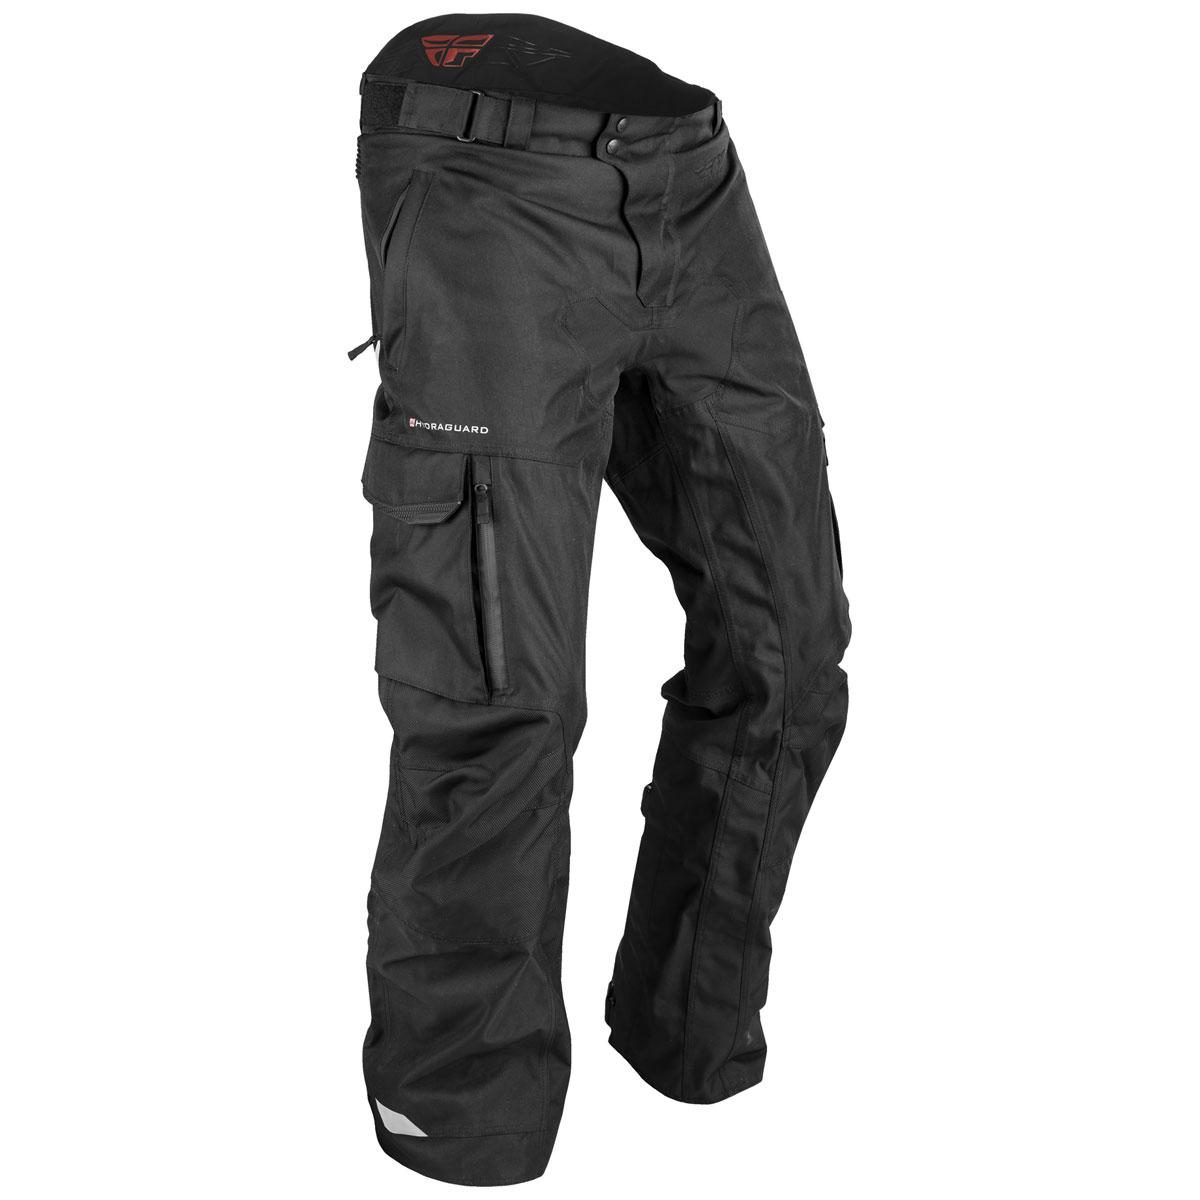 FLY Racing Street Men's Terra Trek Black Riding Pants